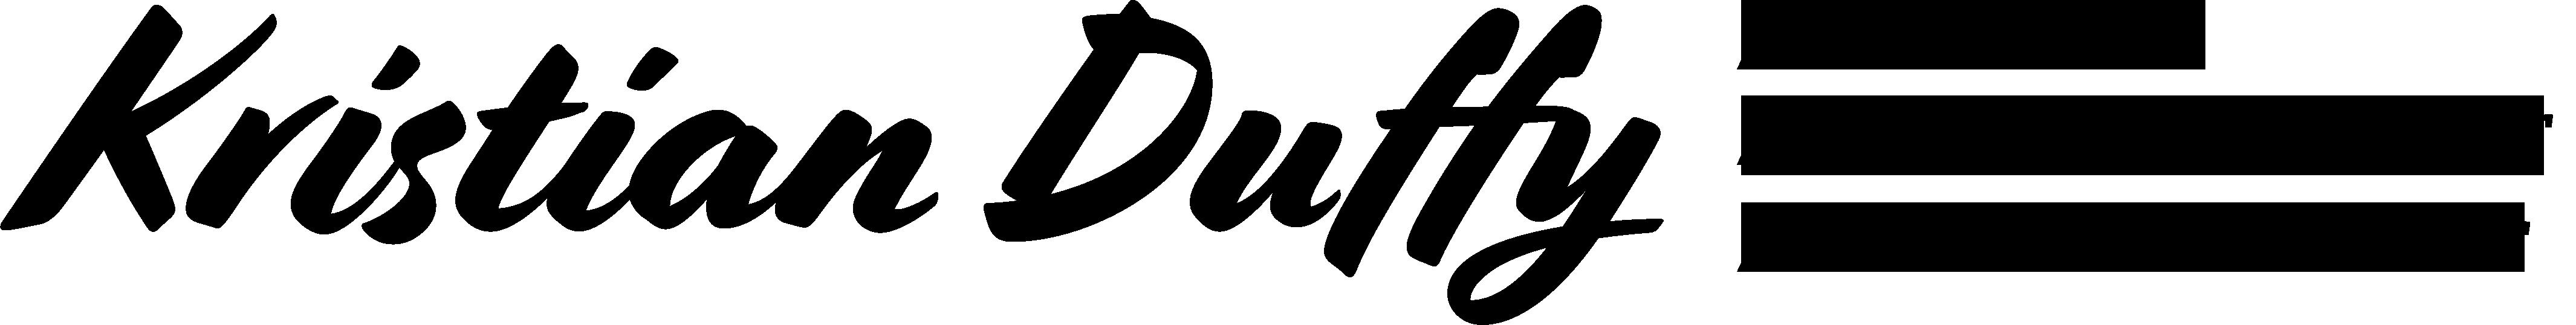 Kristian Duffy